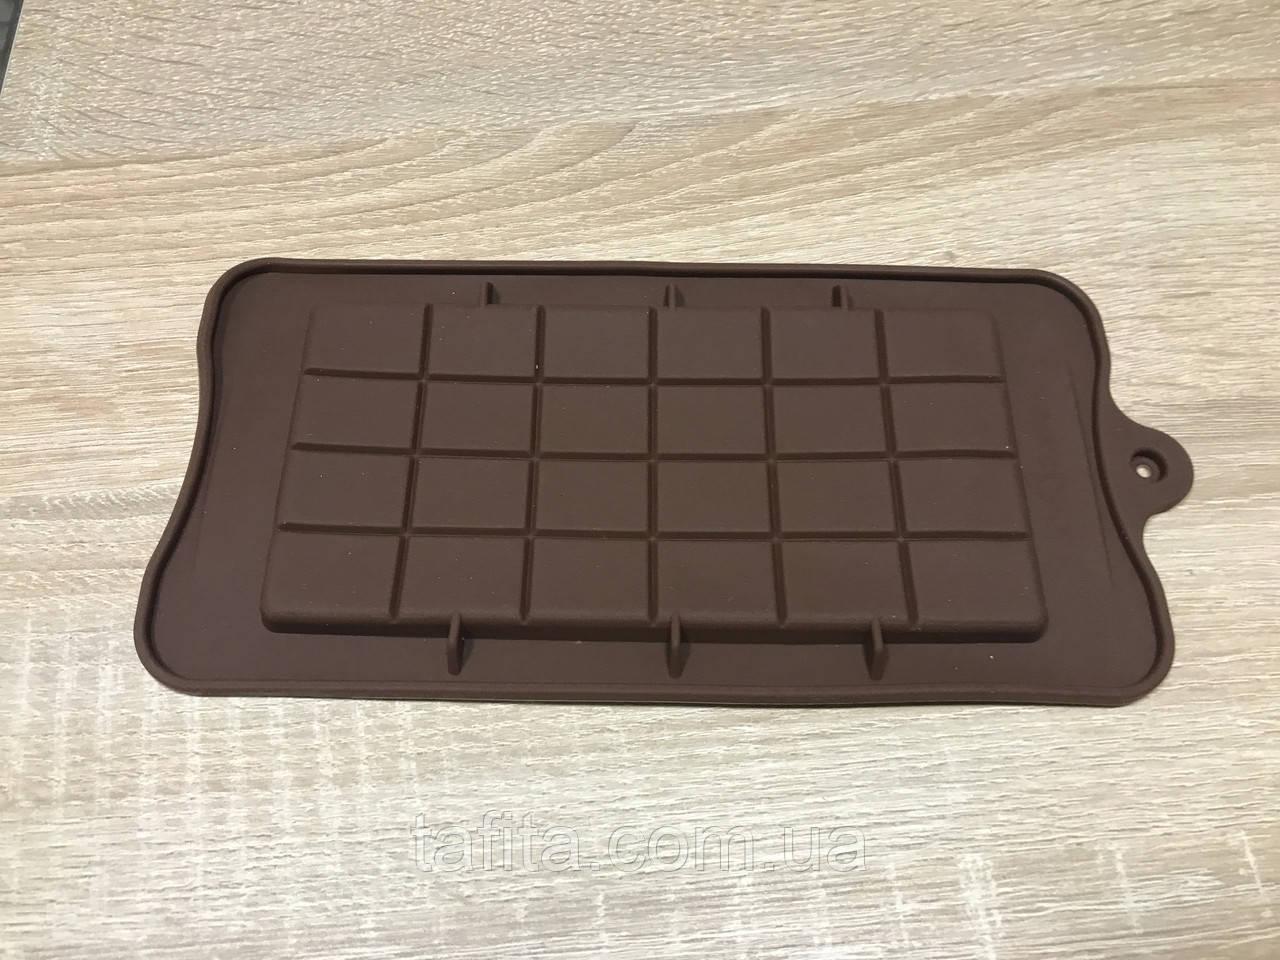 Форма для плитки шоколада